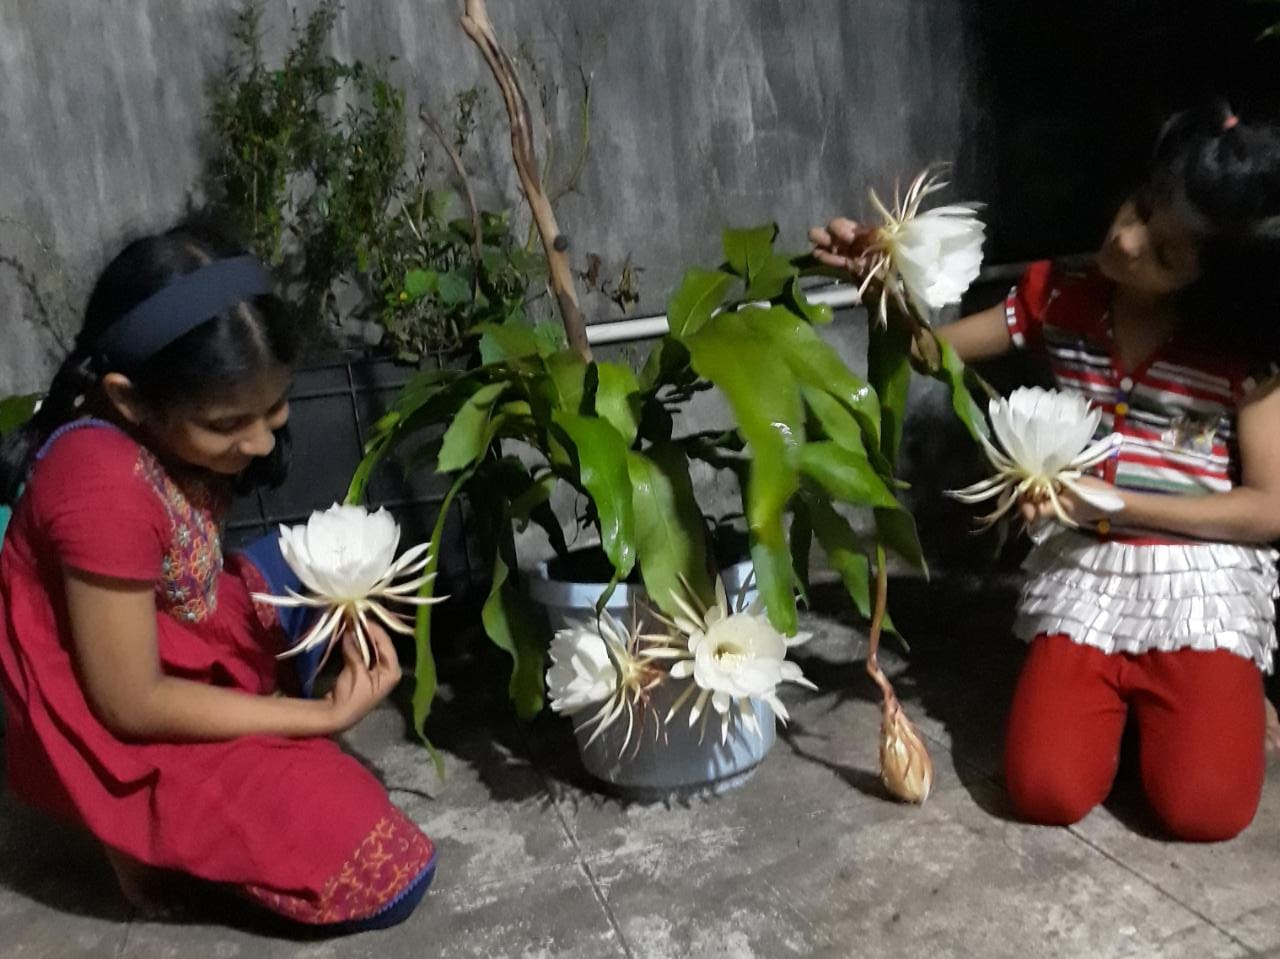 How to create garden, Part 11